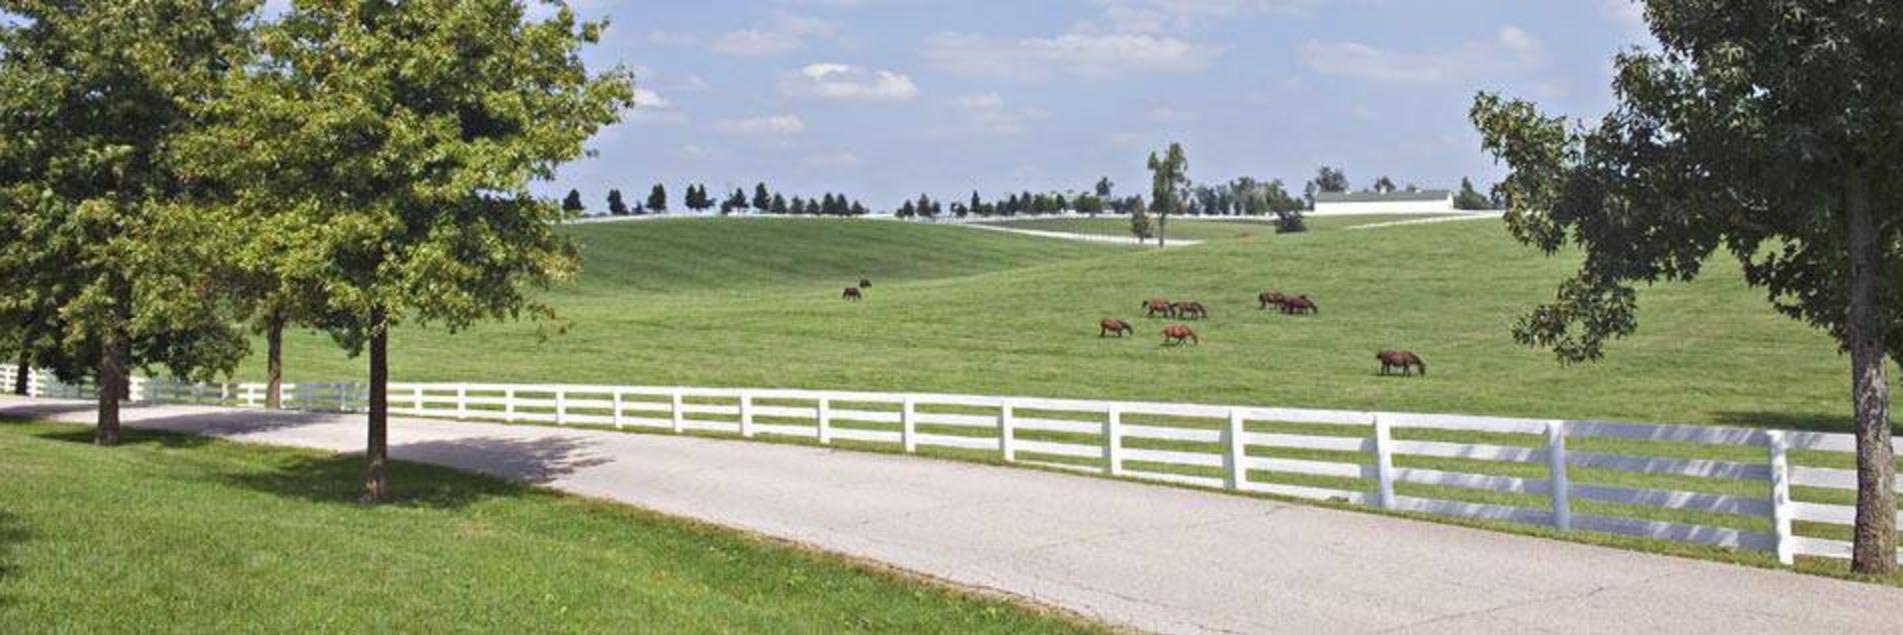 Roadside Horse Farm